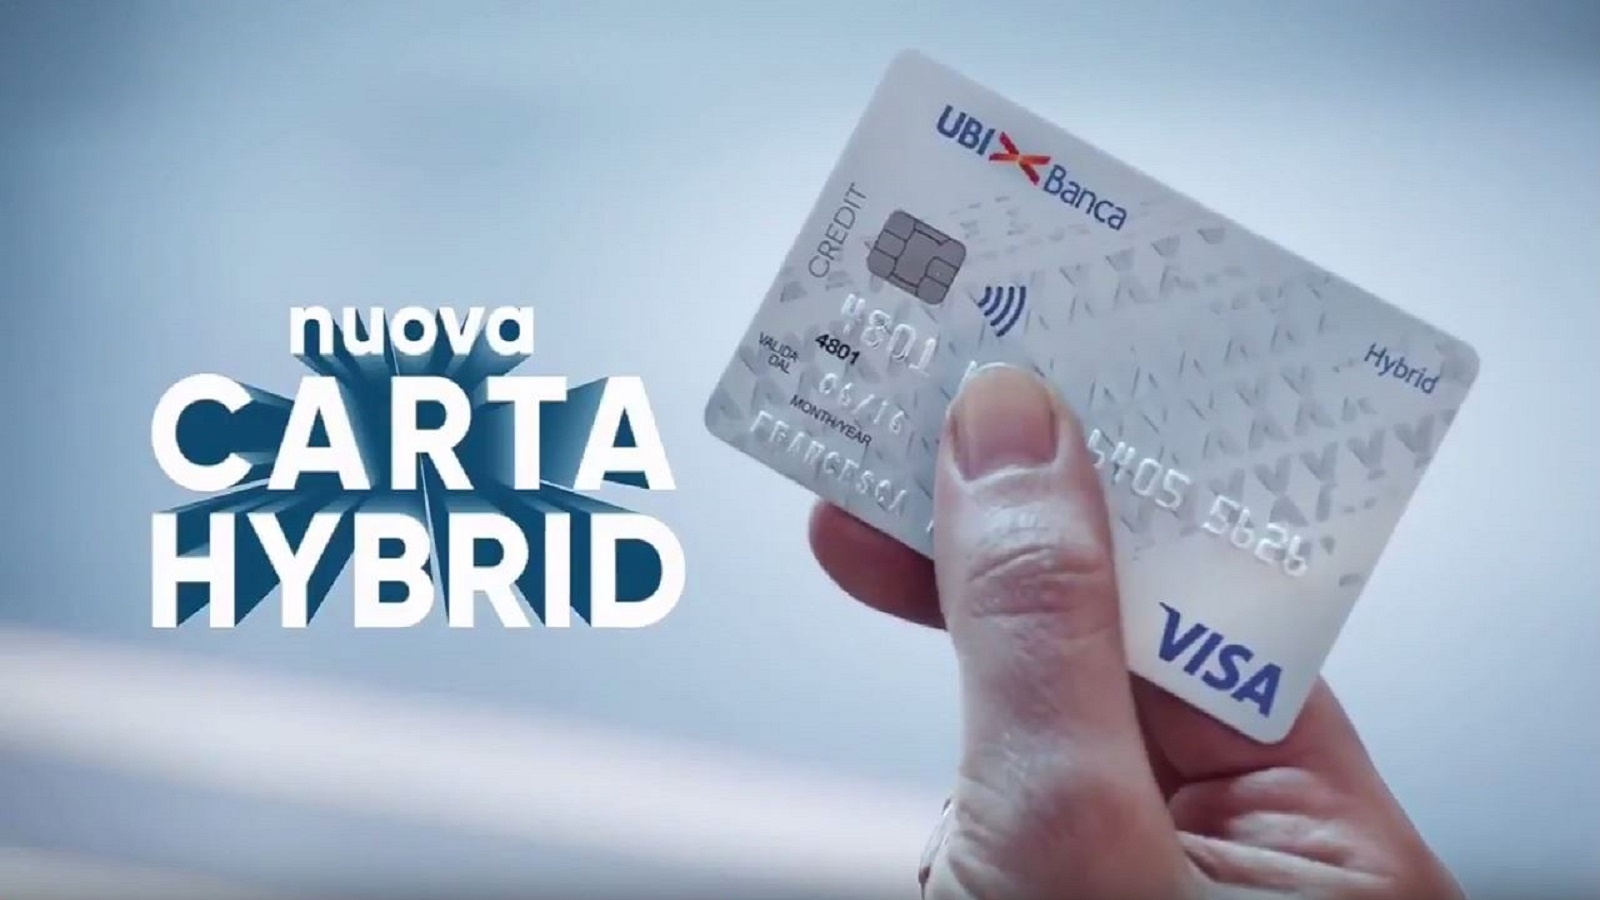 641d7ef91b7ea5 Carta Hybrid di Ubi Banca, non sempre conviene